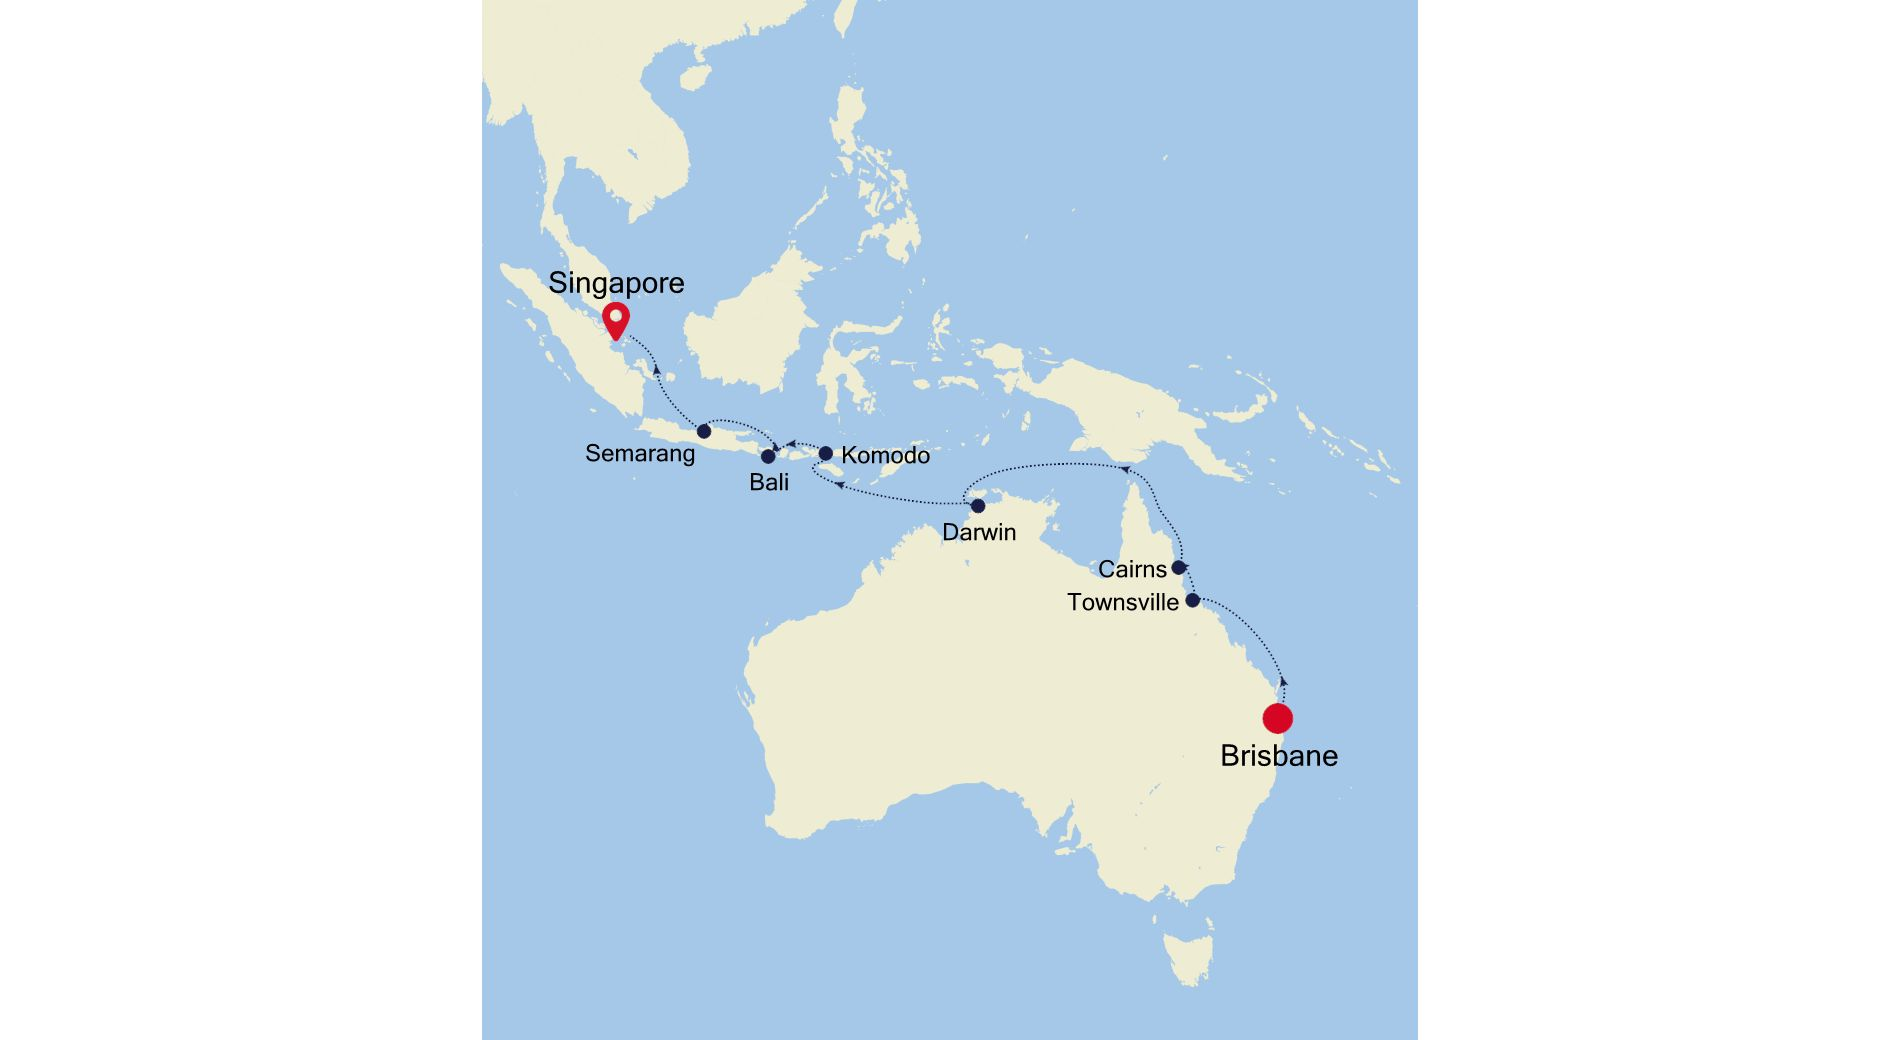 SM210221016 - Brisbane a Singapore